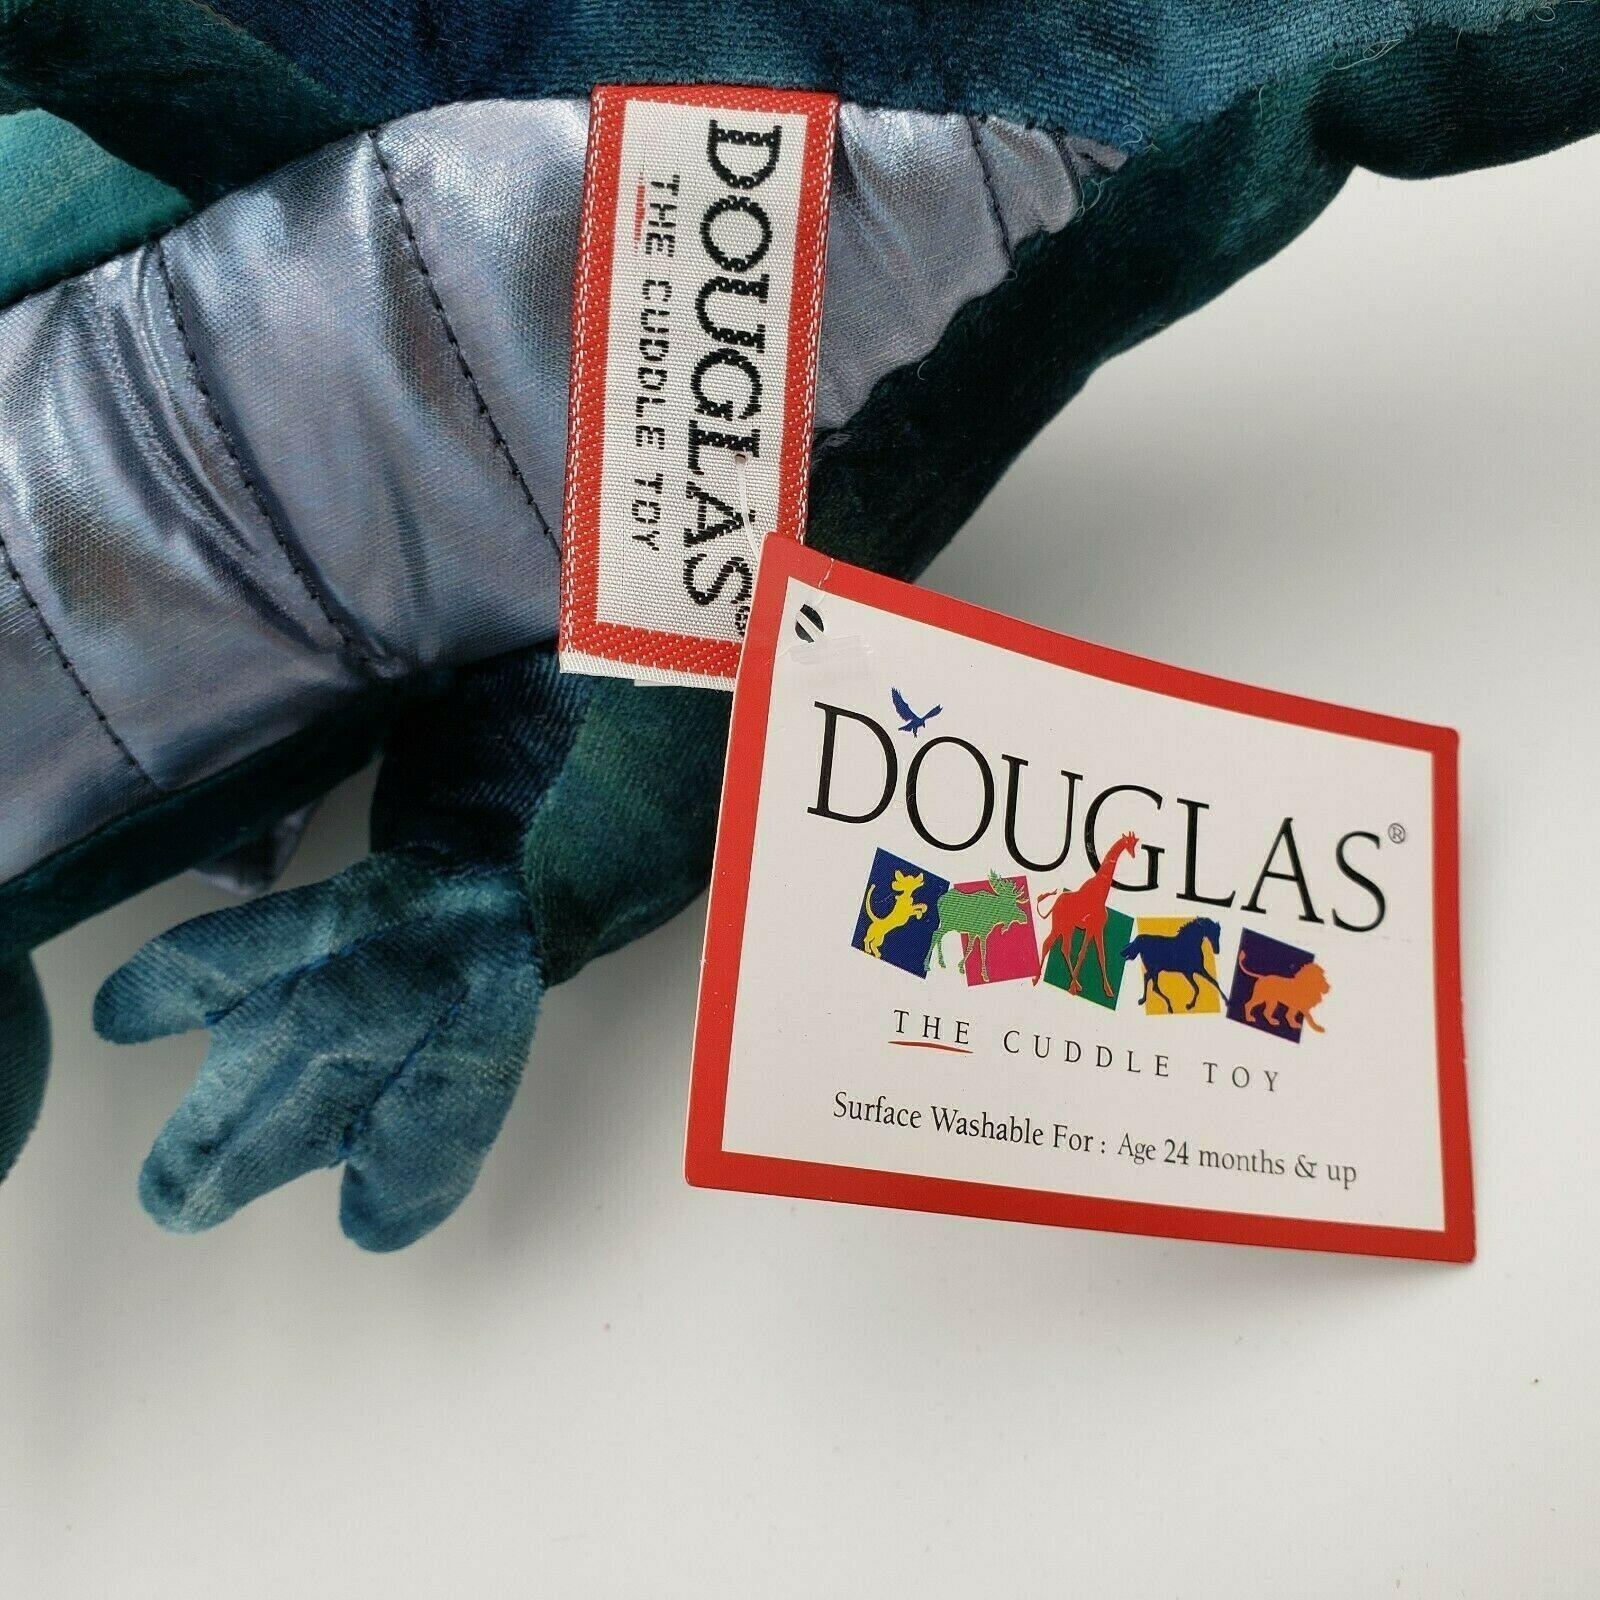 Douglas Cuddle Toy Jade Blue Dragon Plush Stuffed 729 image 7